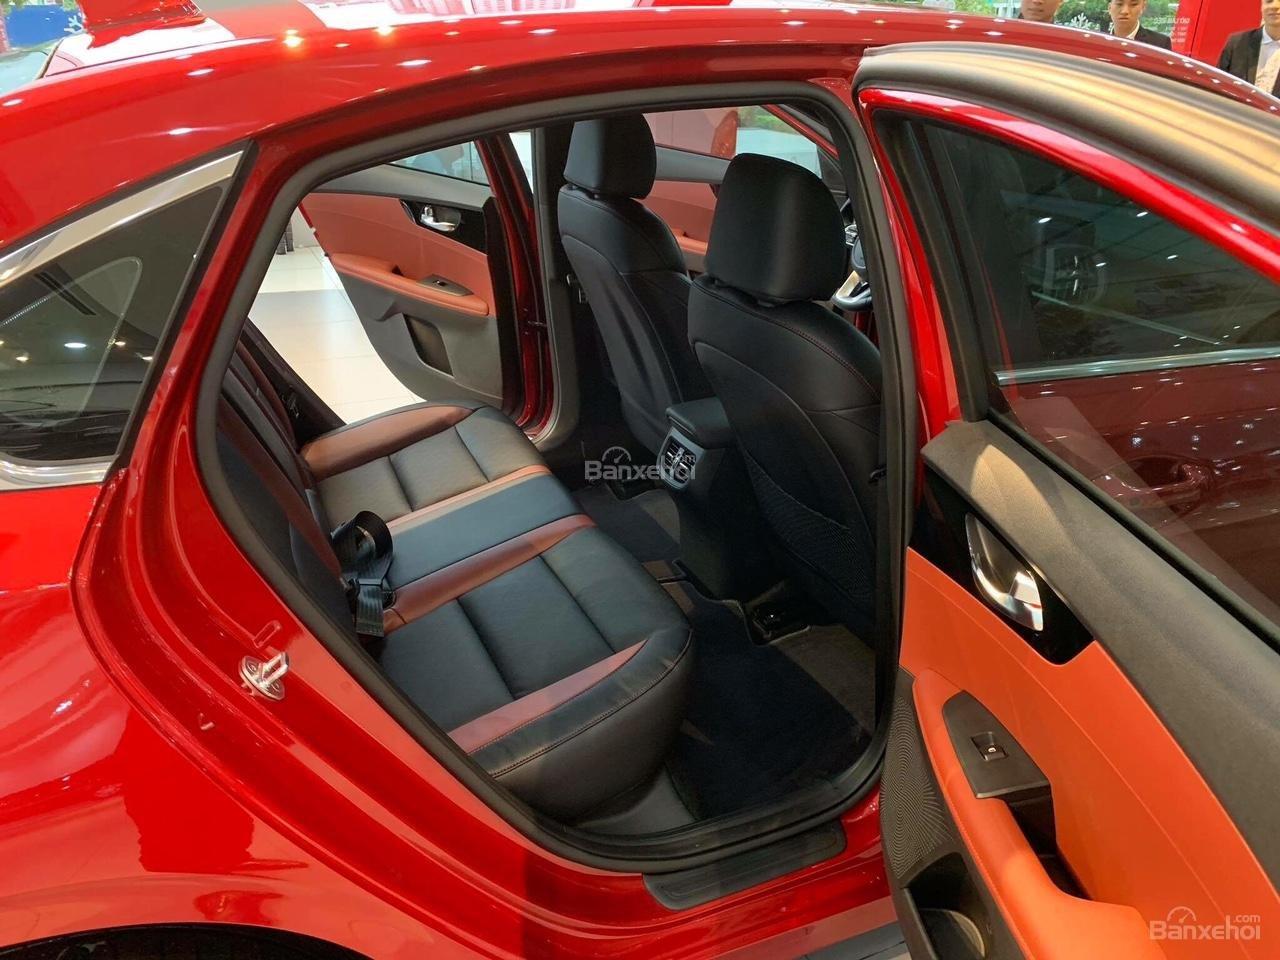 Bán Kia Cerato đời 2019 All New - Giao xe trước Tết-4